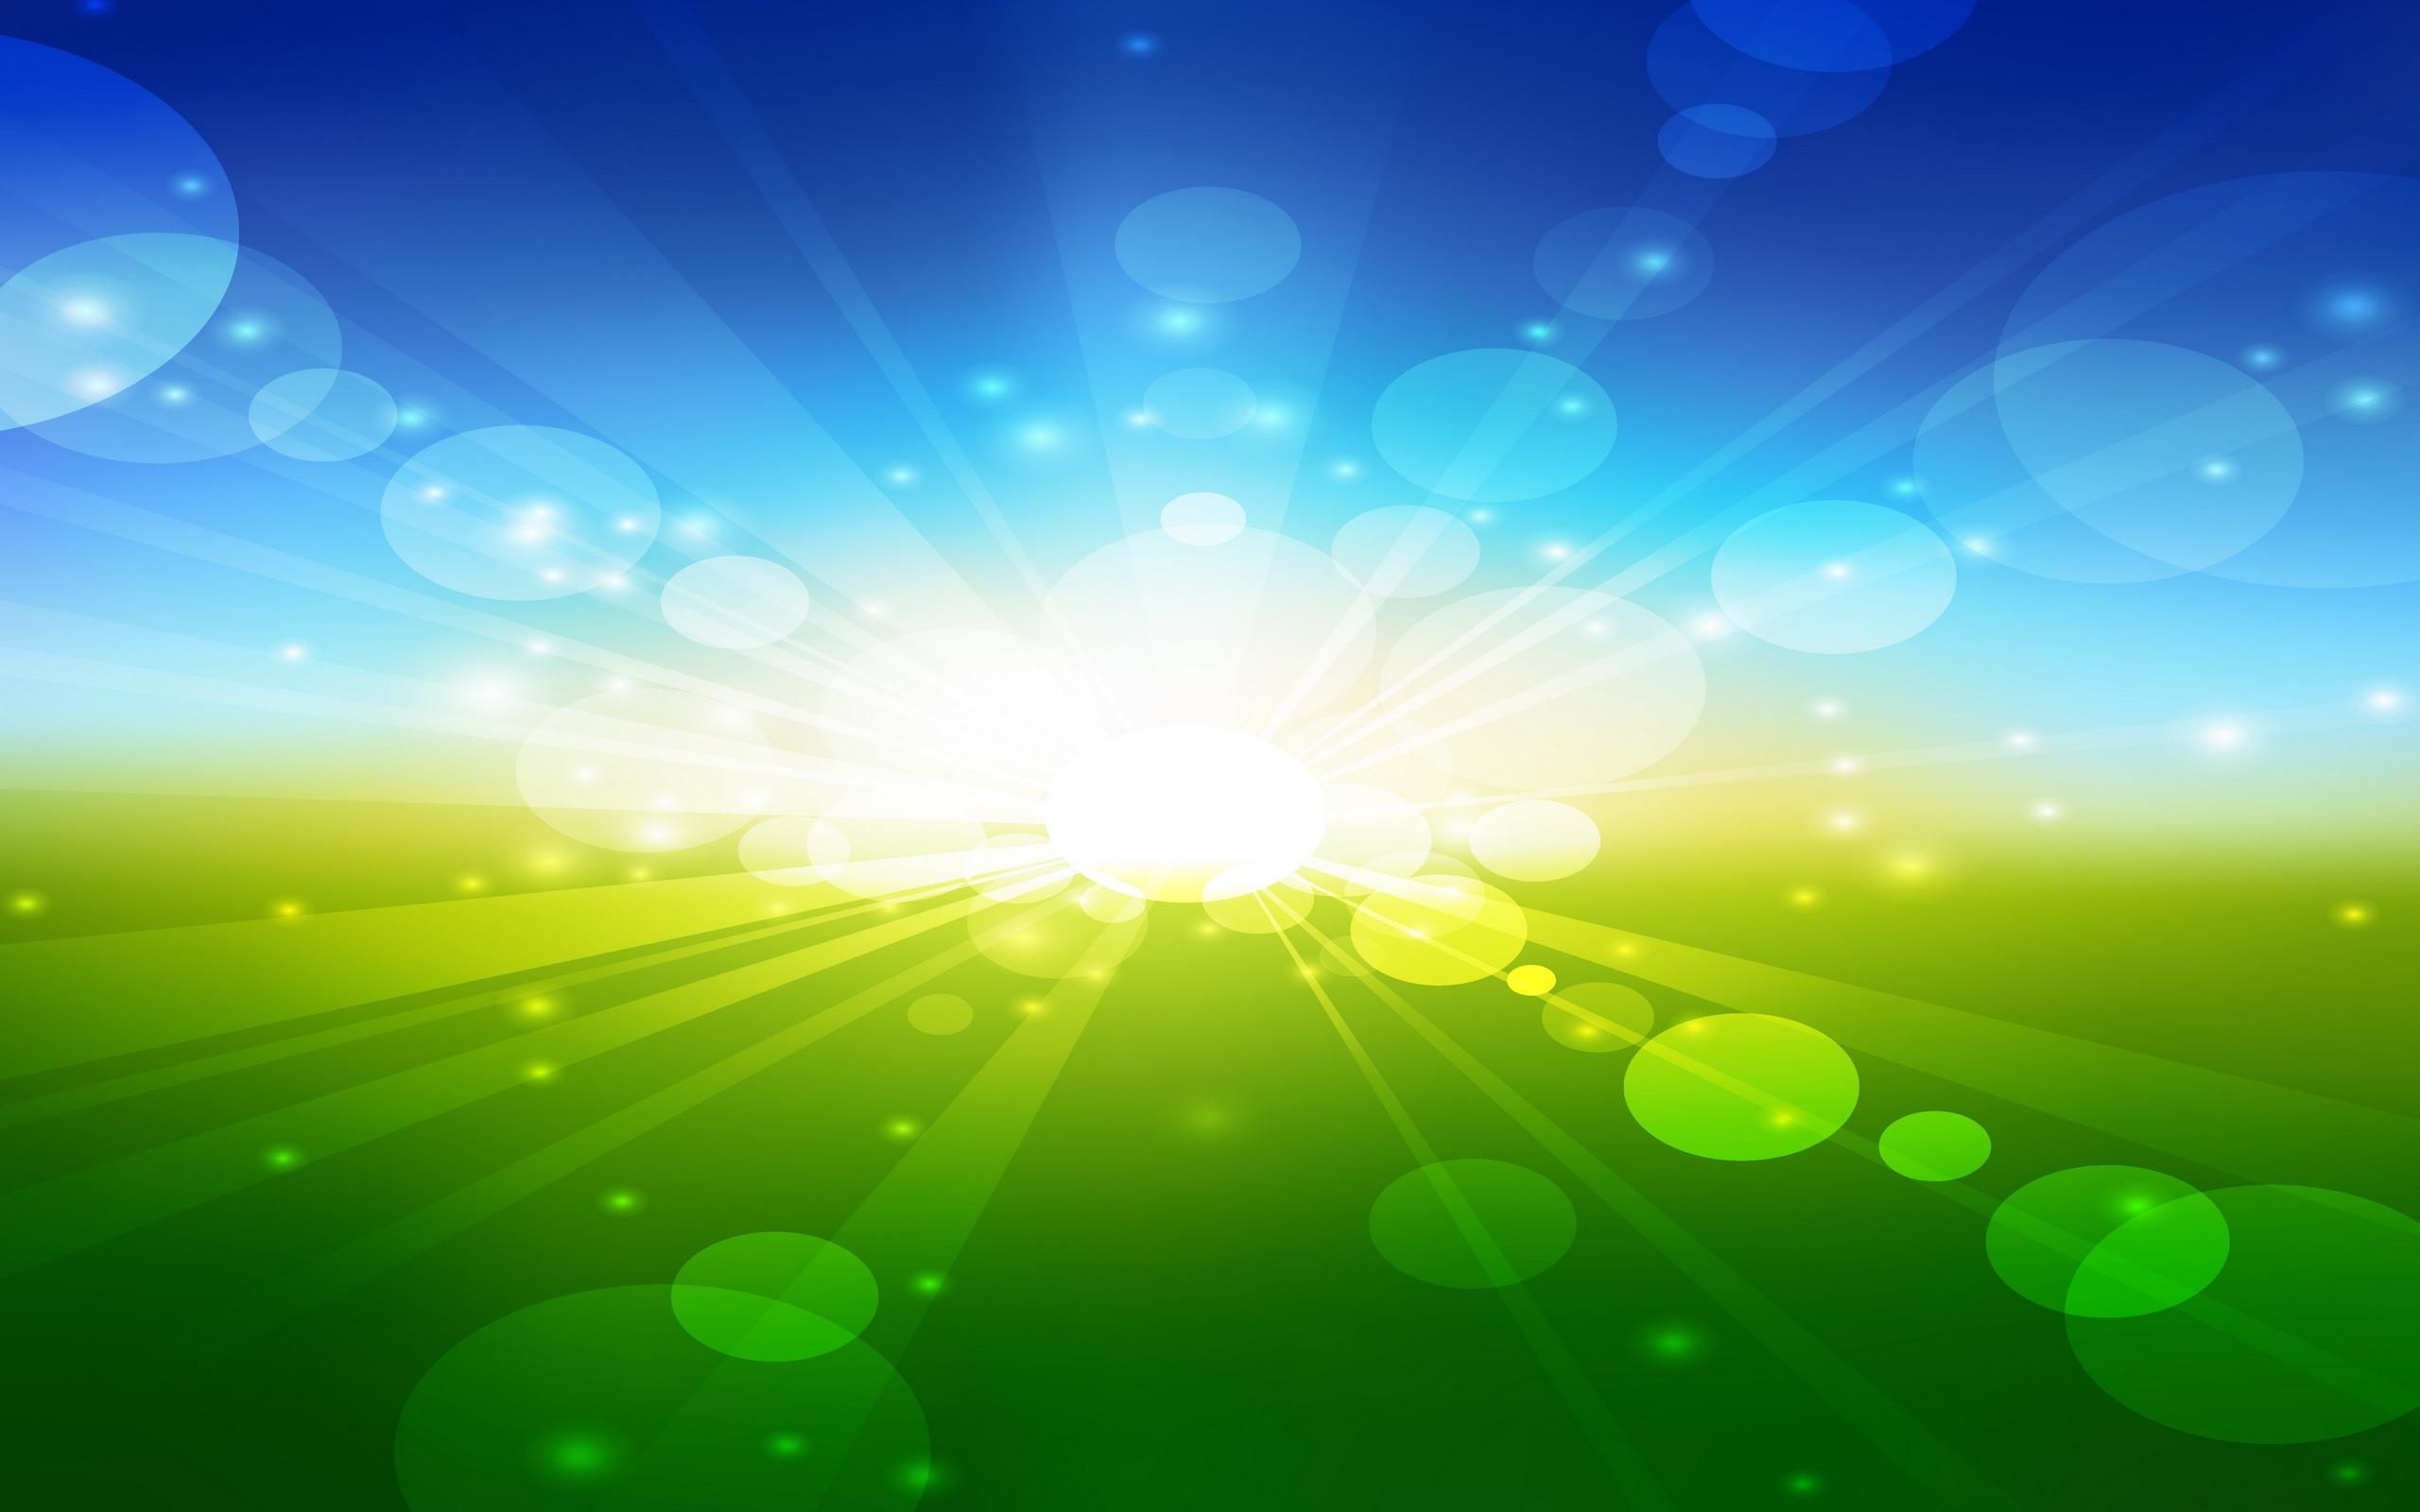 3d Galaxy Wallpaper Widescreen Vector Hd Wallpaper Background Image 2560x1600 Id